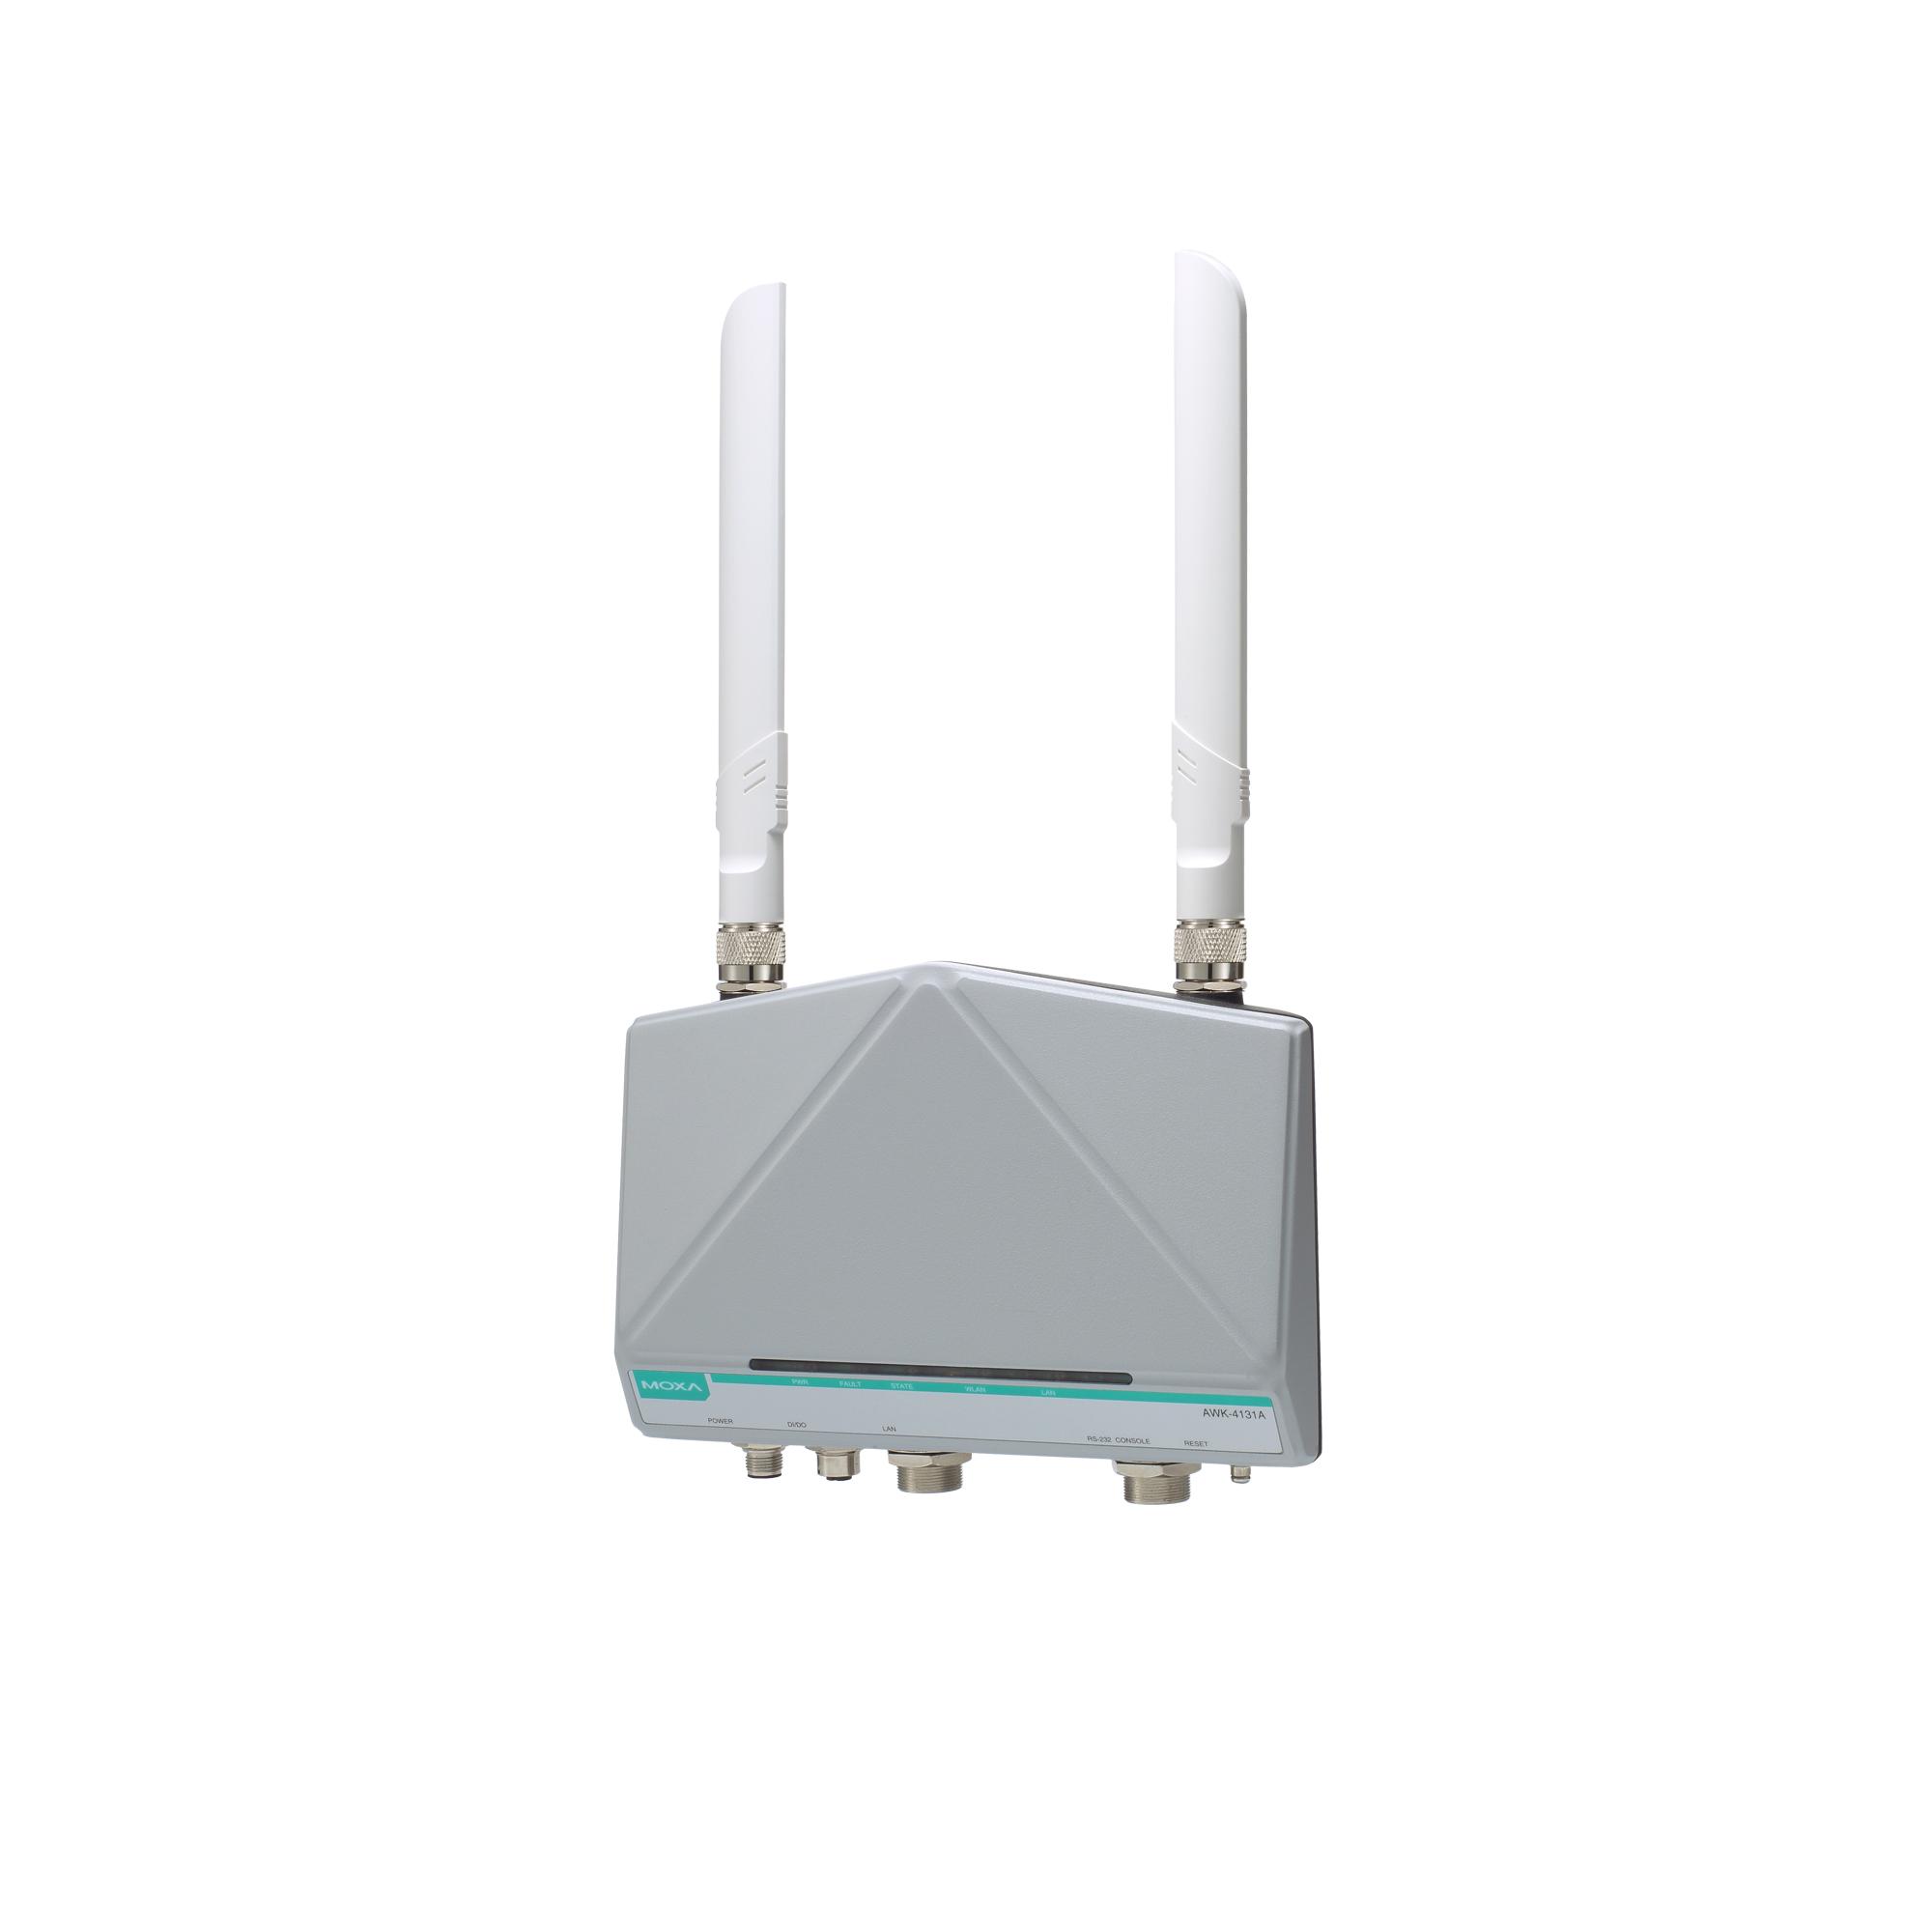 AWK-4131A Series - WLAN AP/Bridge/Client | MOXA